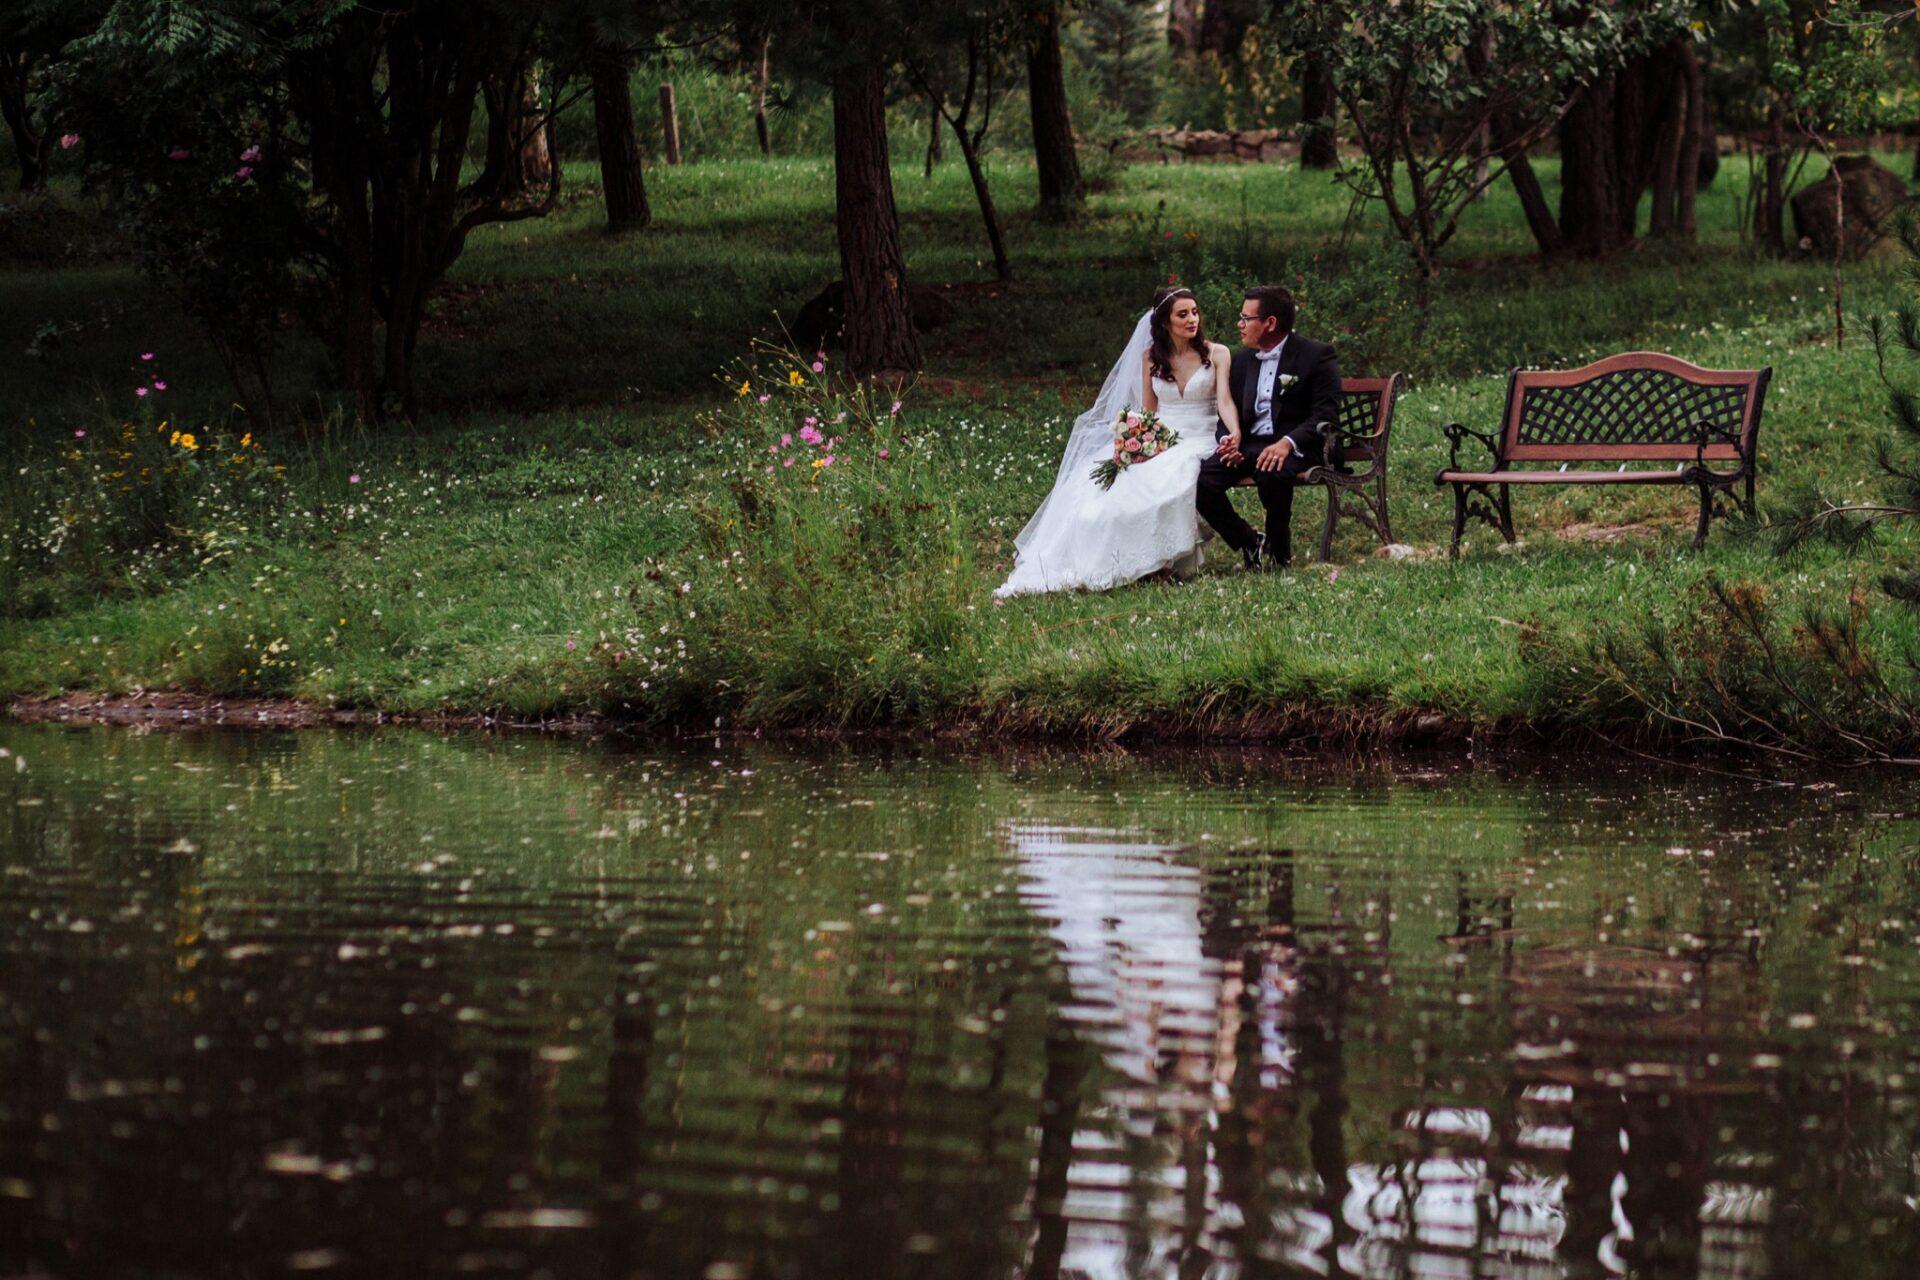 javier_noriega_fotografo_bodas_teul_zacatecas_wedding_photographer28